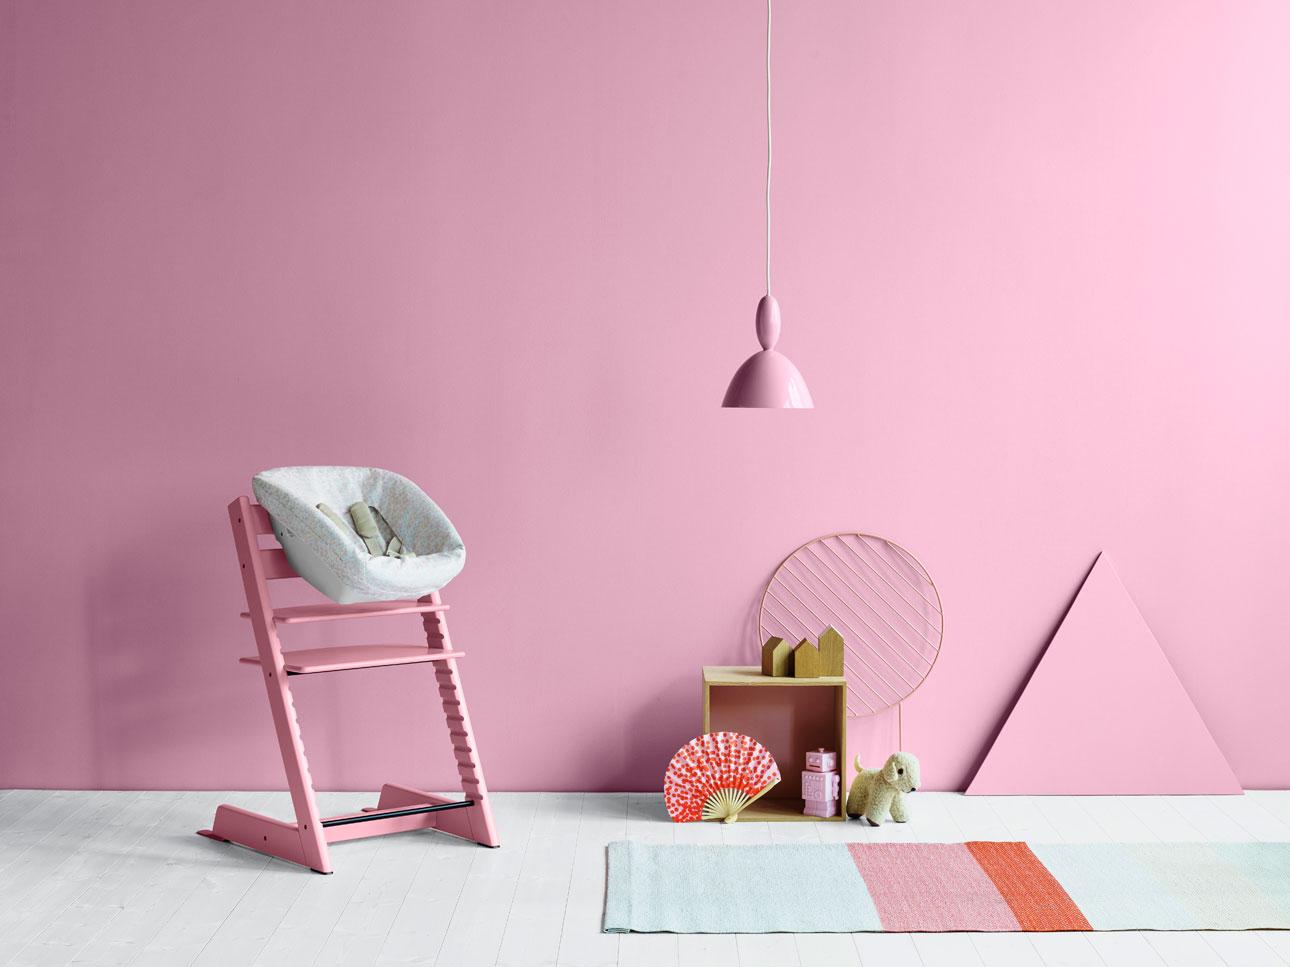 Stokke Tripp Trapp Soft Pink